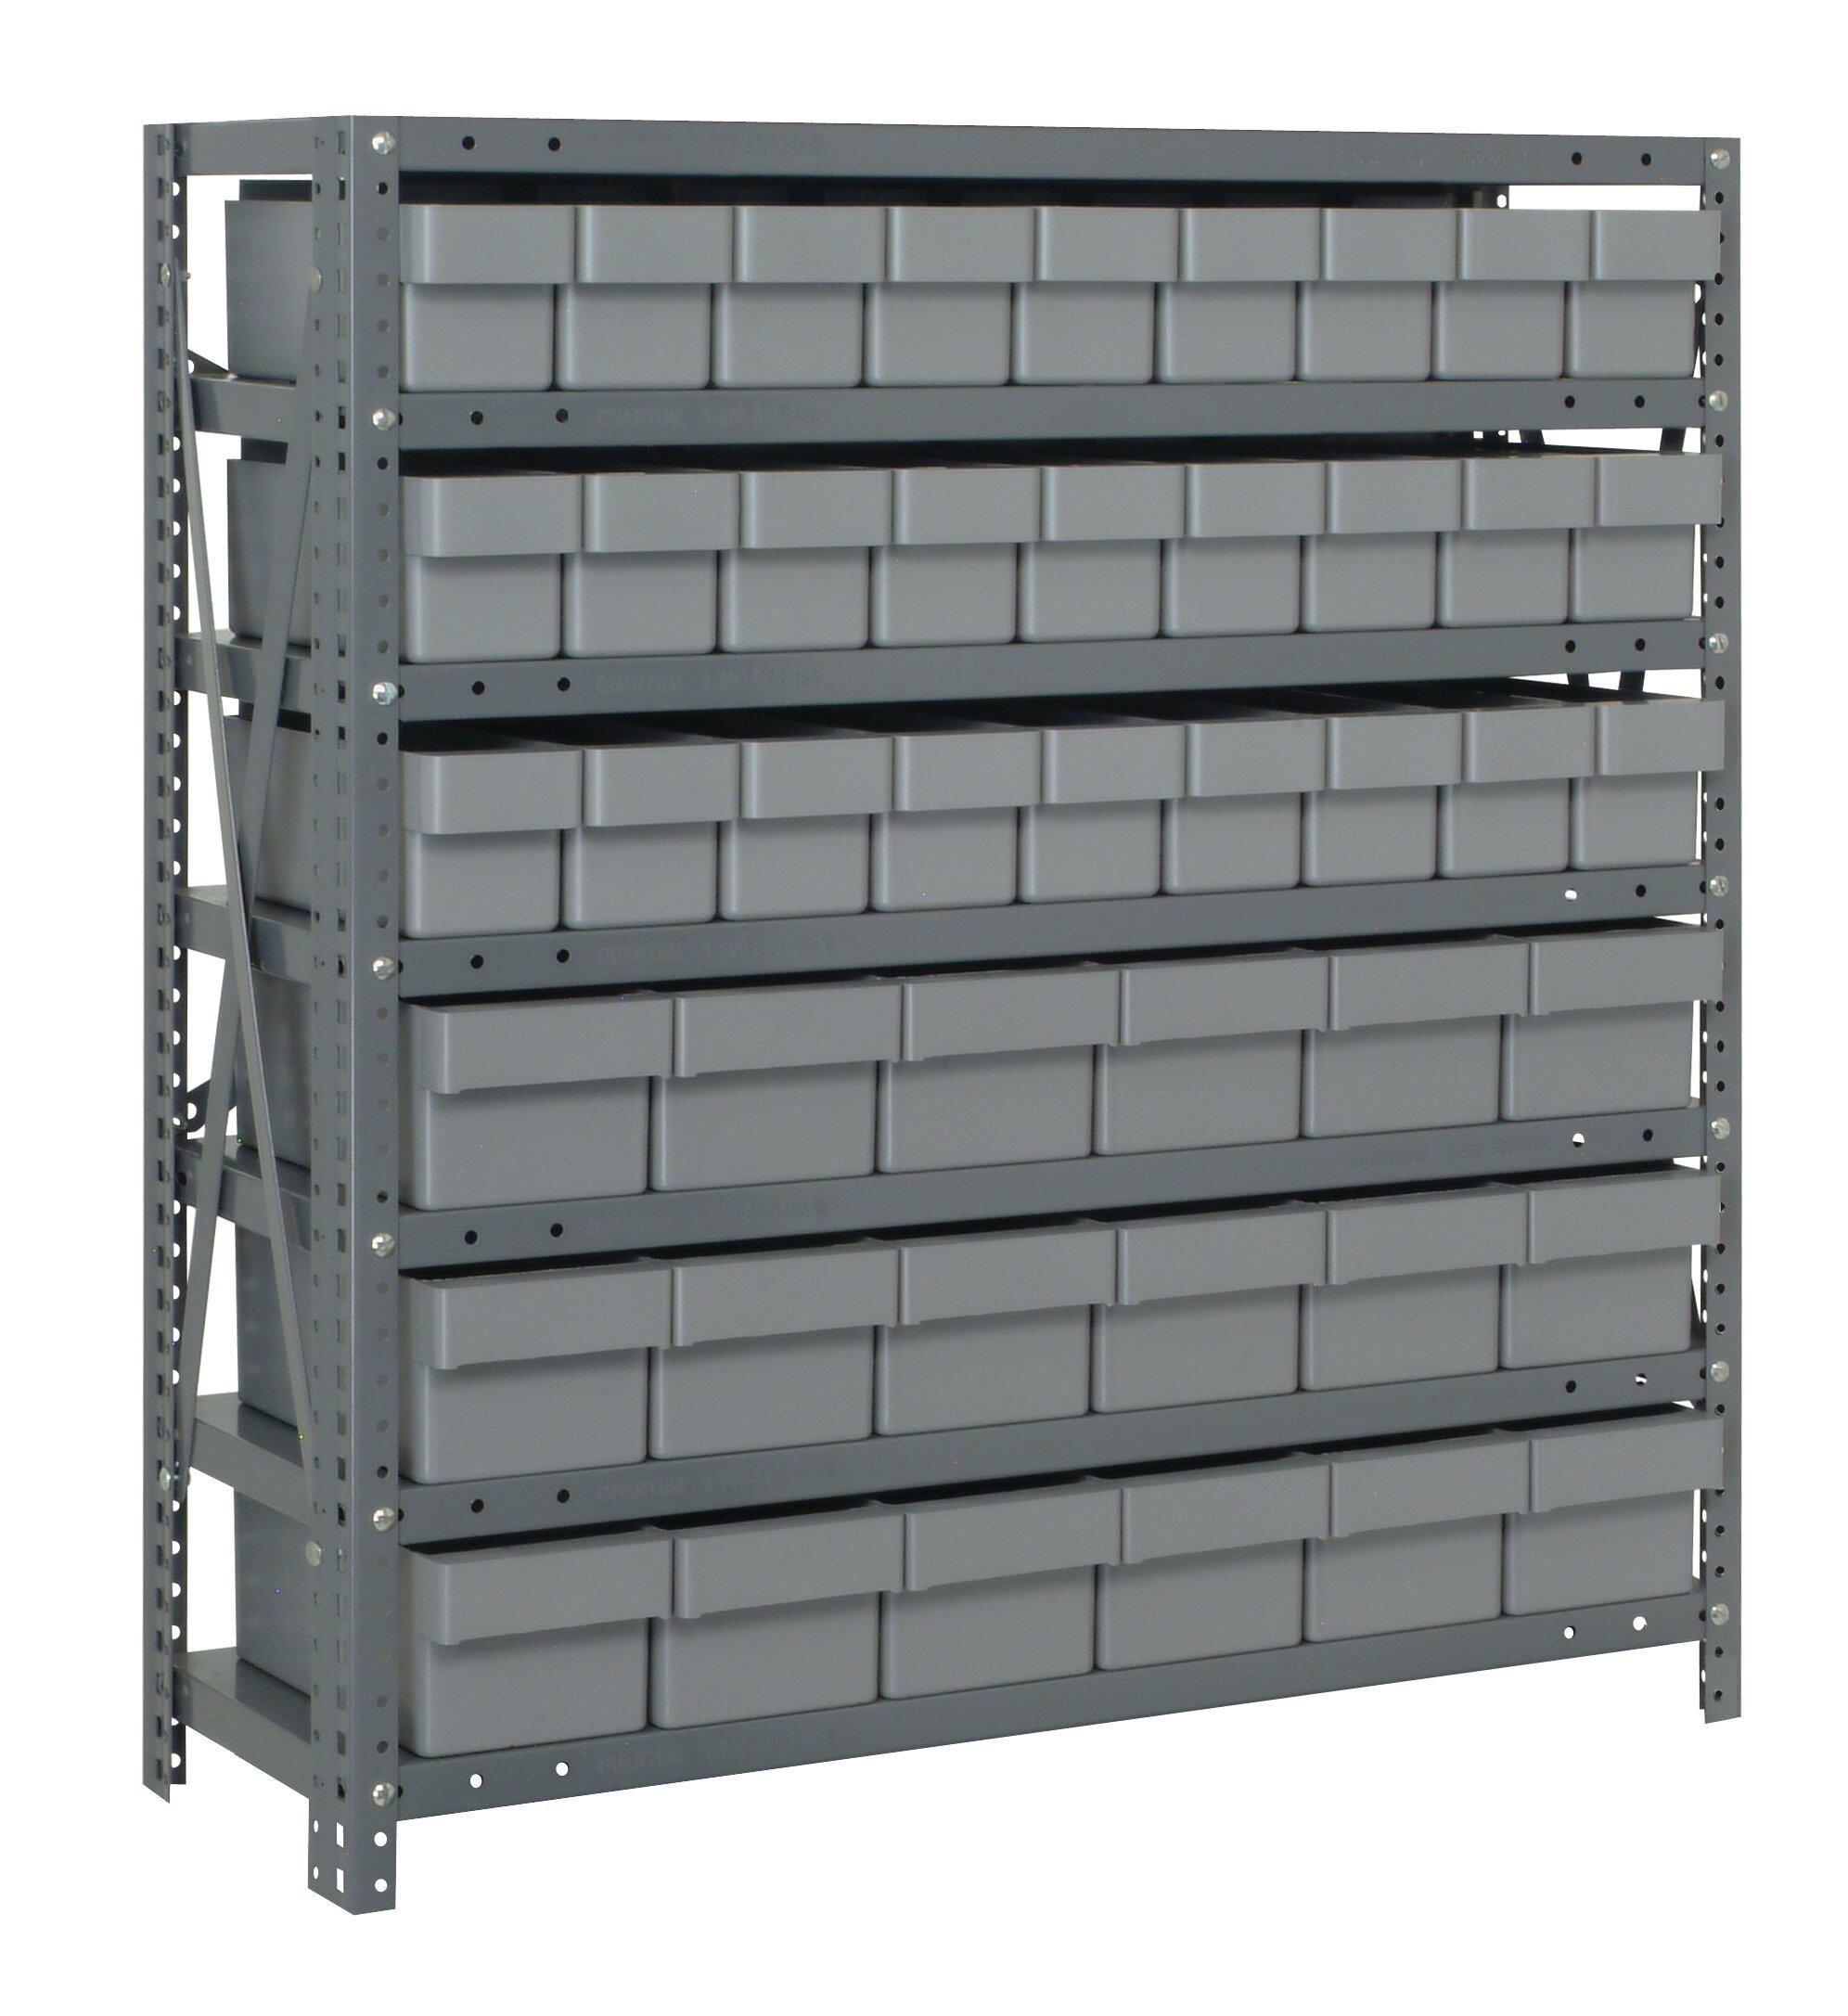 Standard 2 Feet To 4 Feet Quantum Storage Storage Racks Shelving Units You Ll Love In 2021 Wayfair